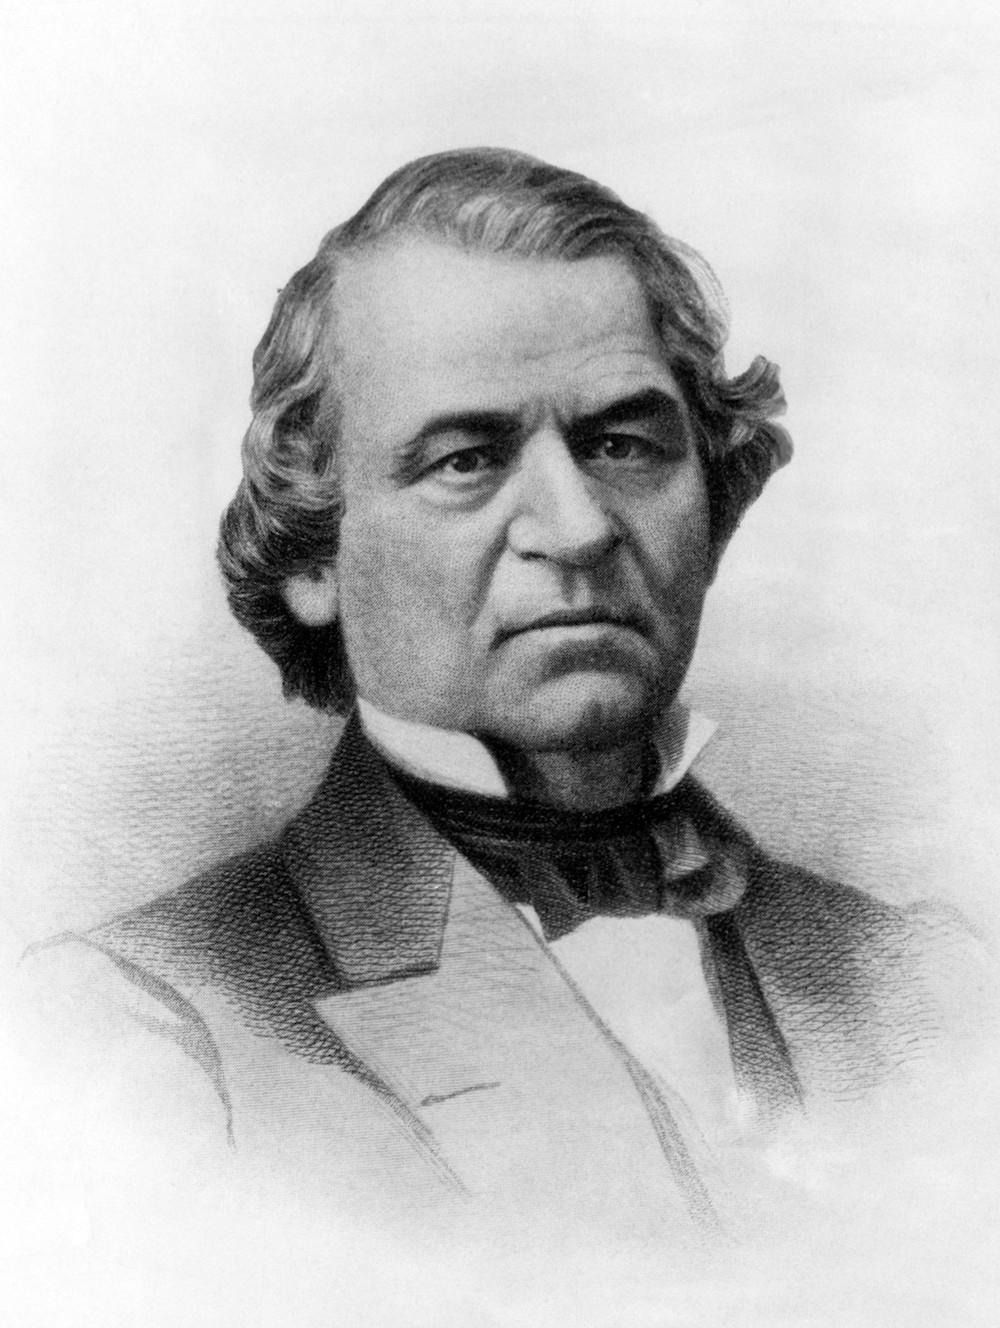 Andrew Johnson, 17th President, ca. 1860s.